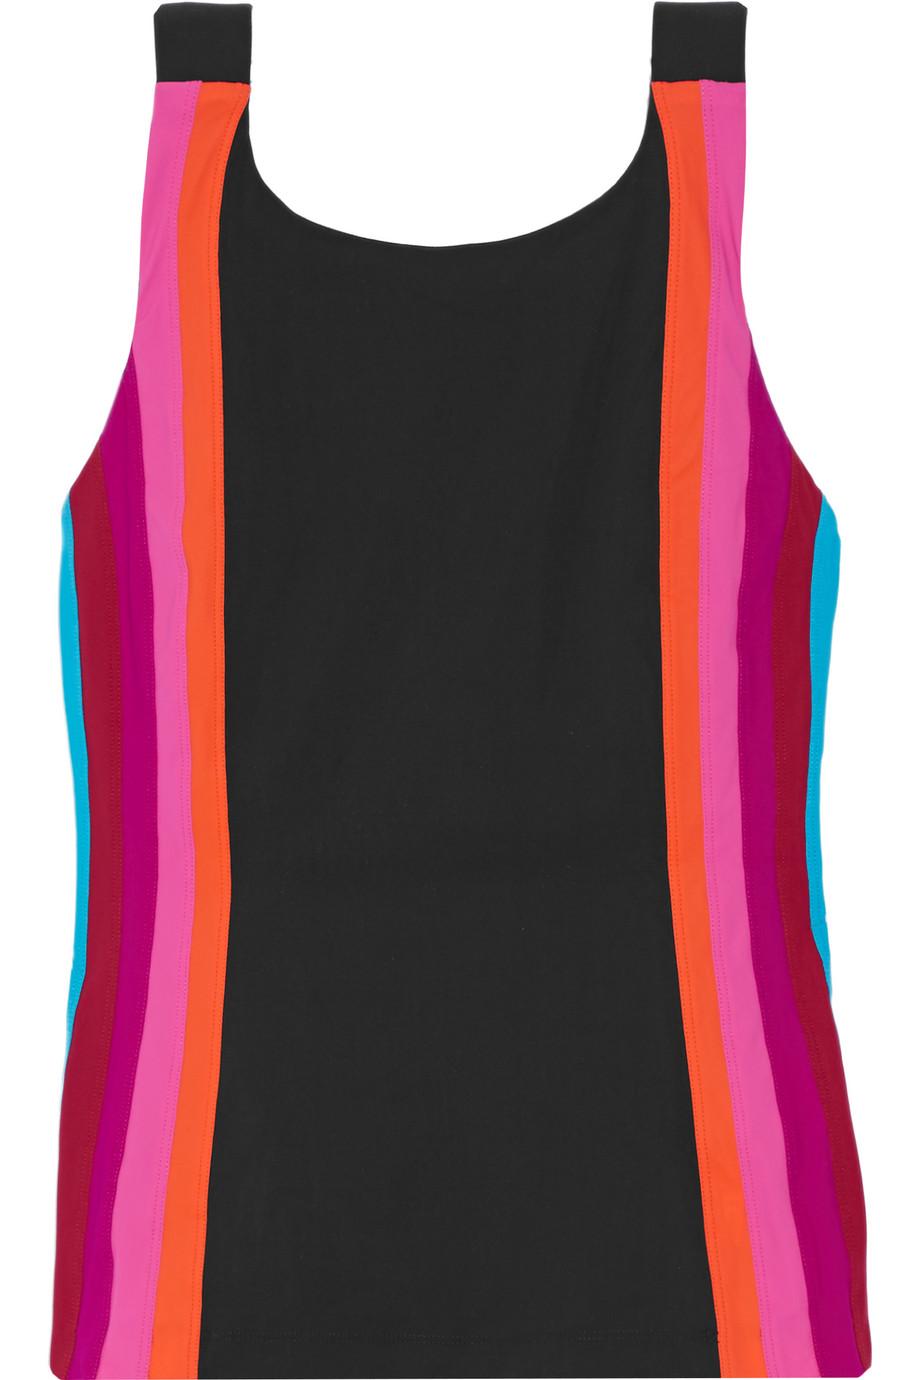 Limu Paneled Stretch-Jersey Tank, Black/Pink, Women's, Size: 00